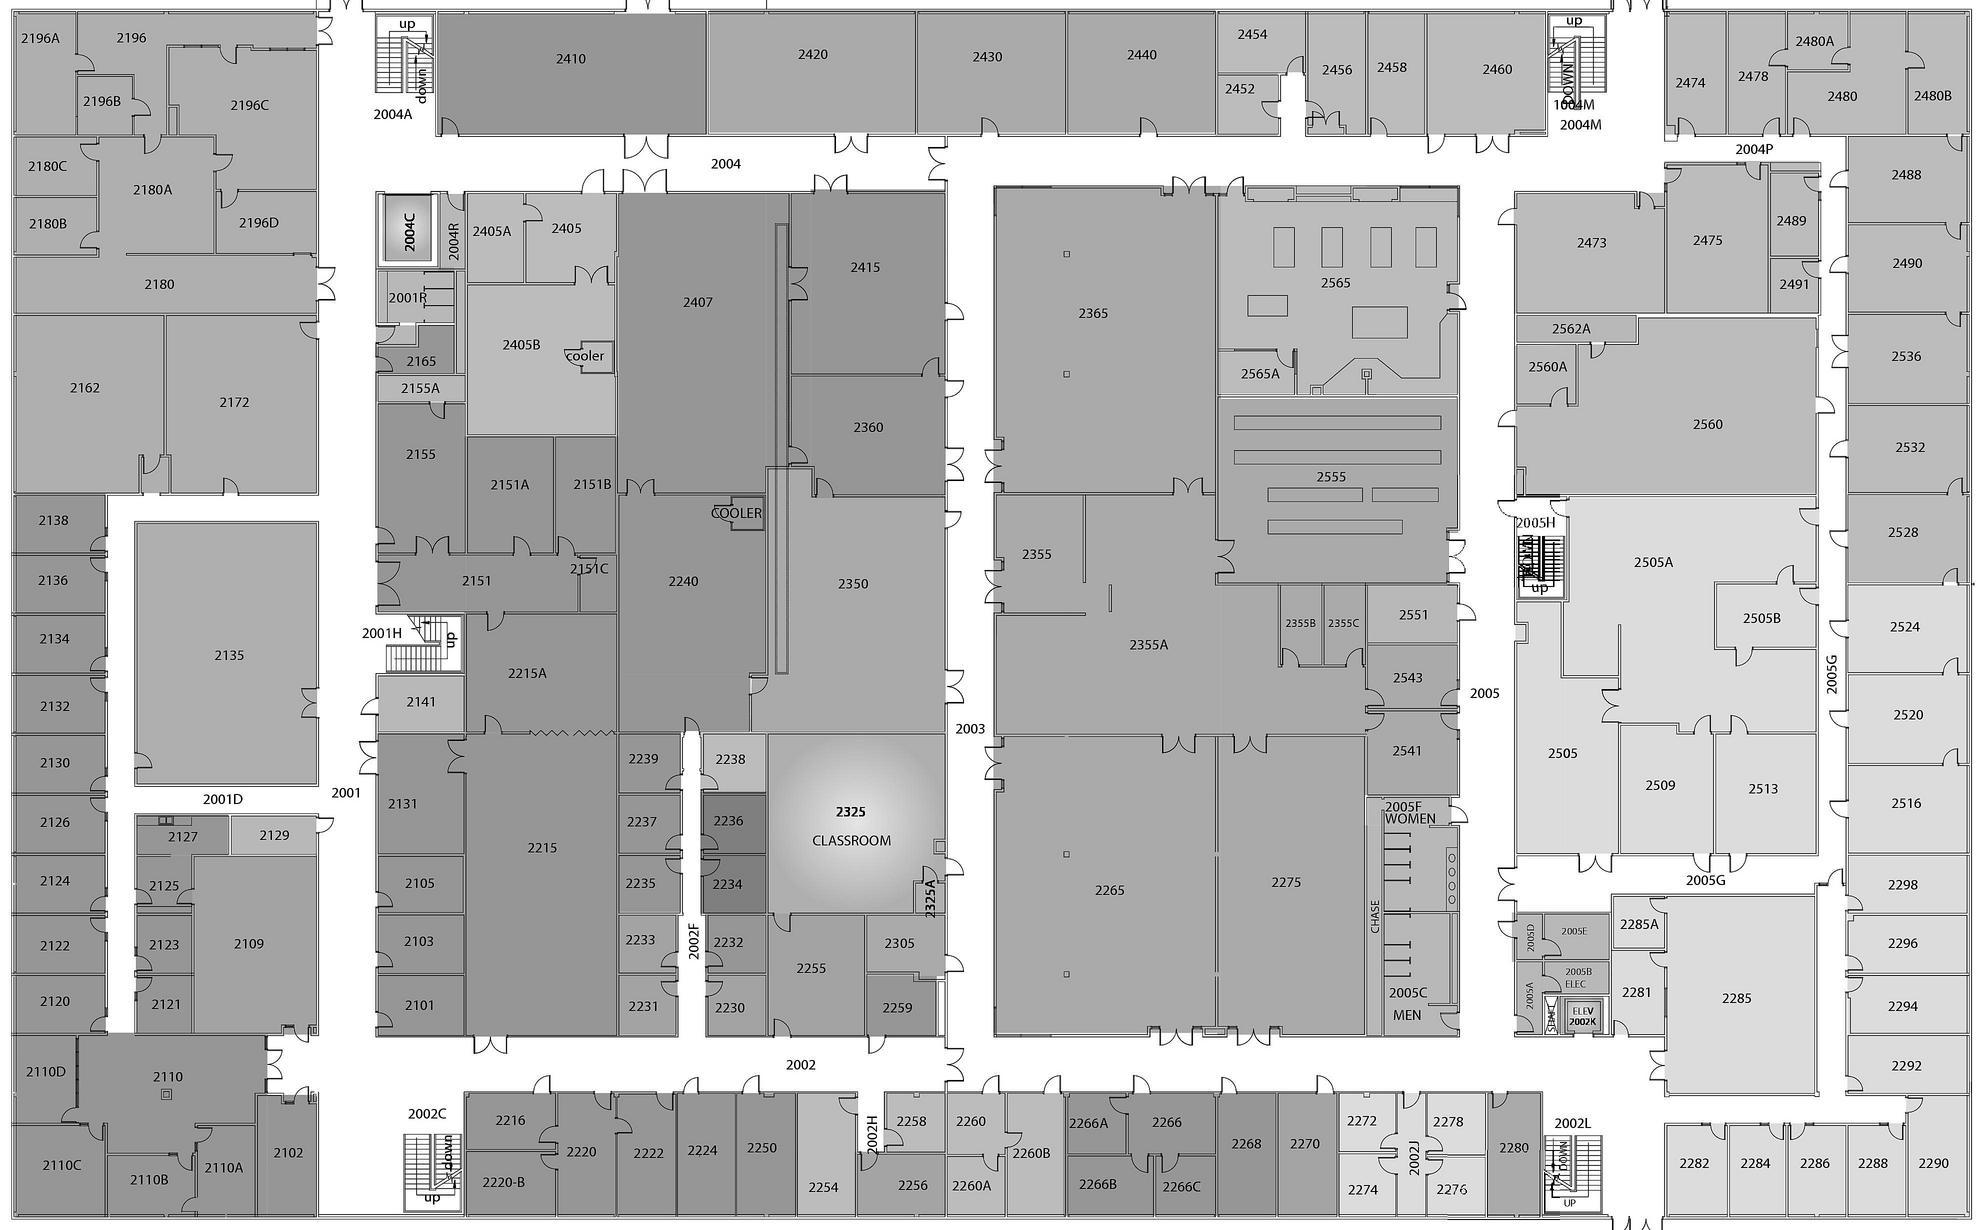 www/floormap/meb2fl-4.jpg